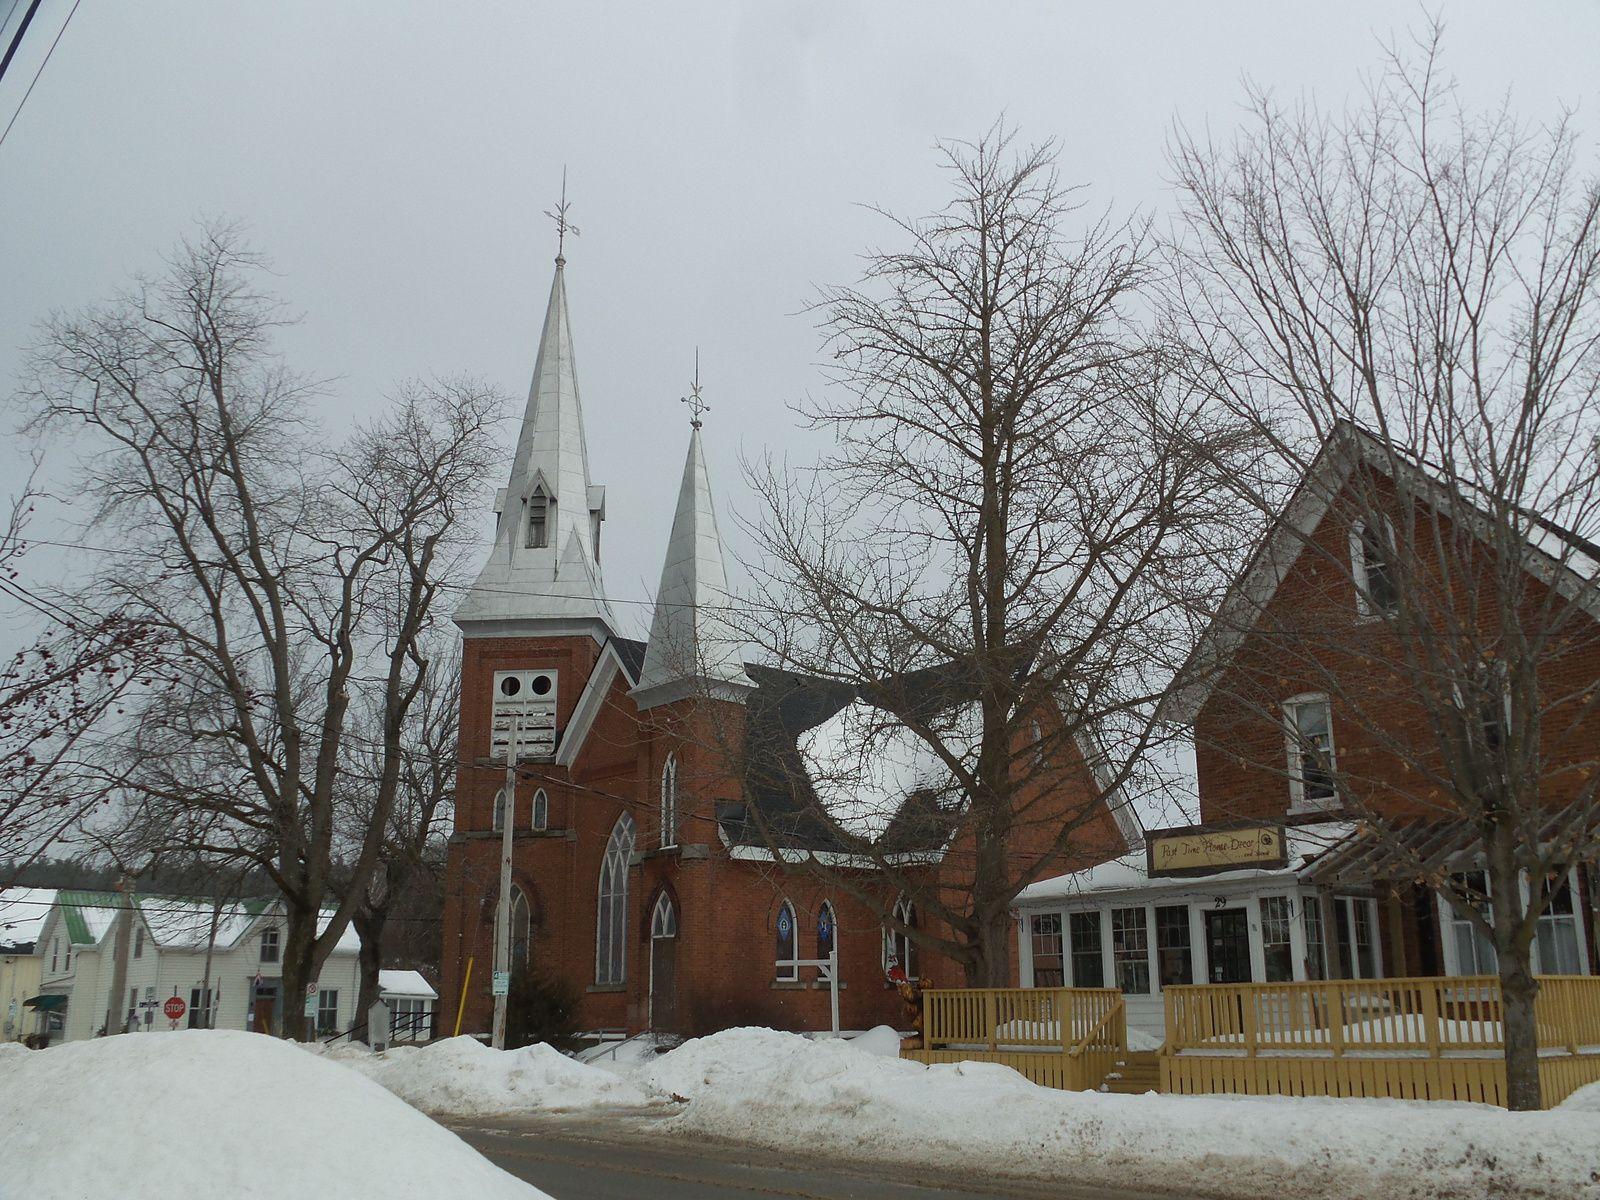 Life is good au village de Westport, Ontario - Réjanne